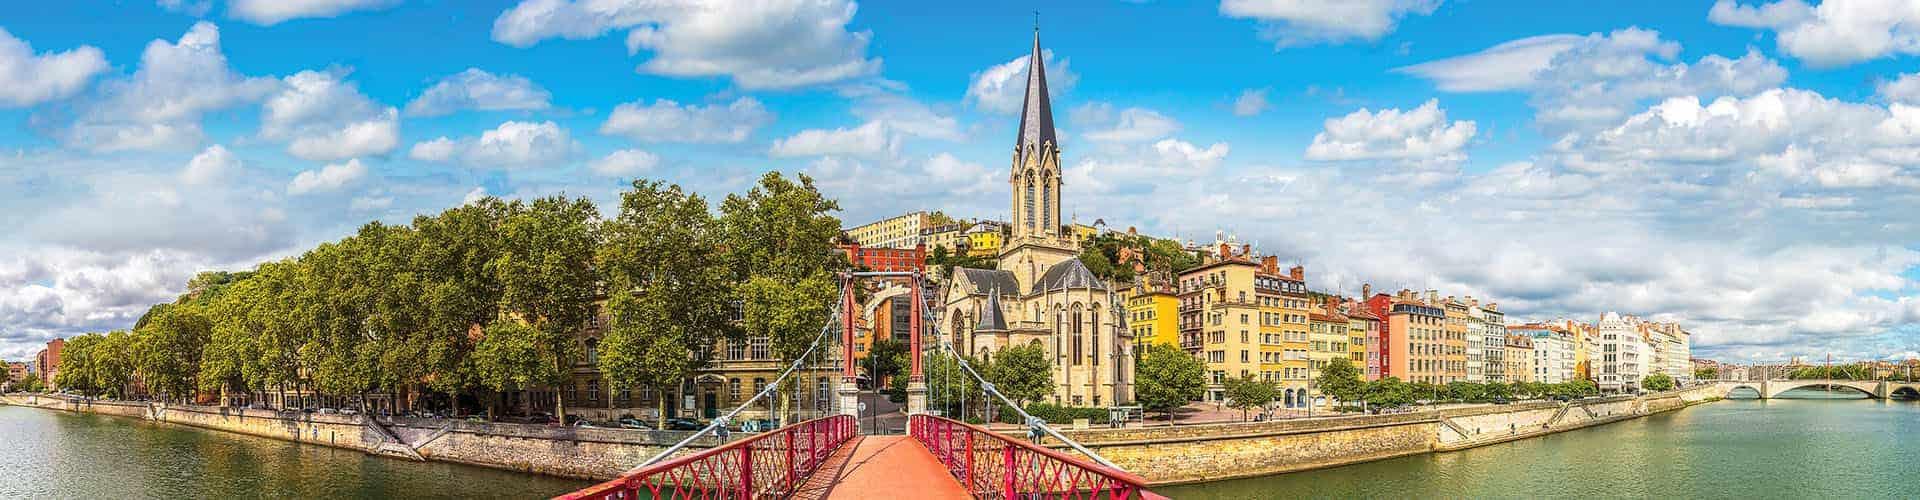 Free tour Aix en Provence - Turismo en Francia